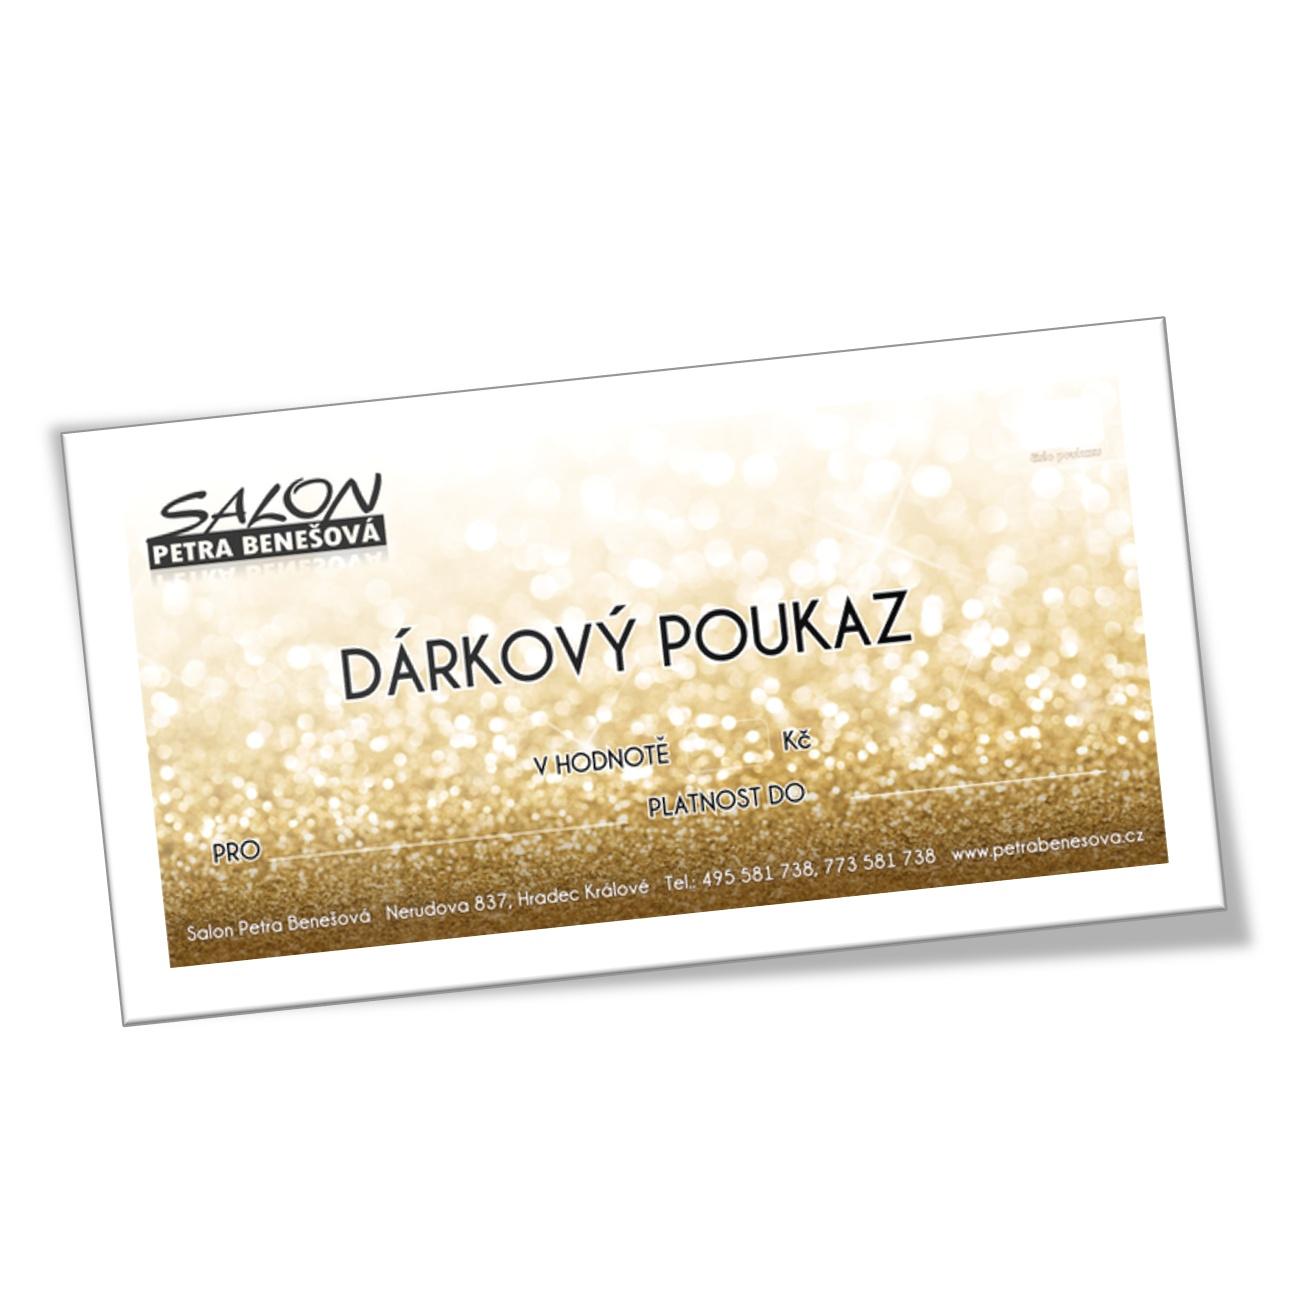 Darkovy Poukaz 500 Kc Online Verze Salon Petra Benesova